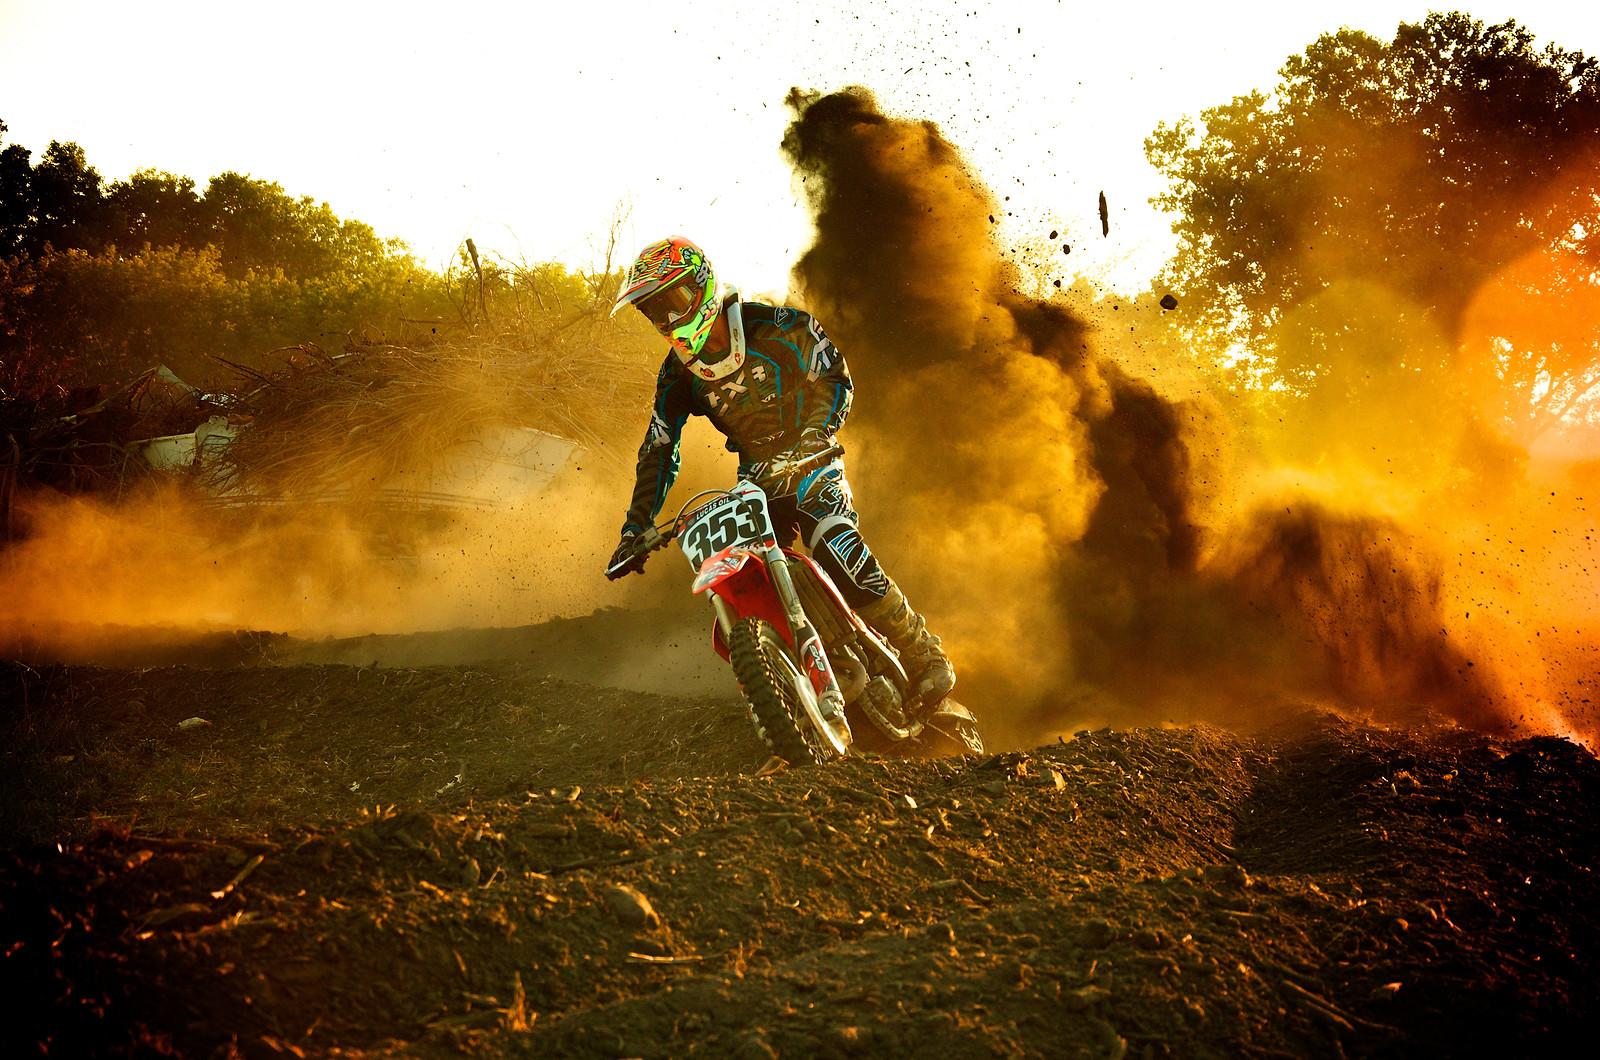 7570995 - seven50seven - Motocross Pictures - Vital MX